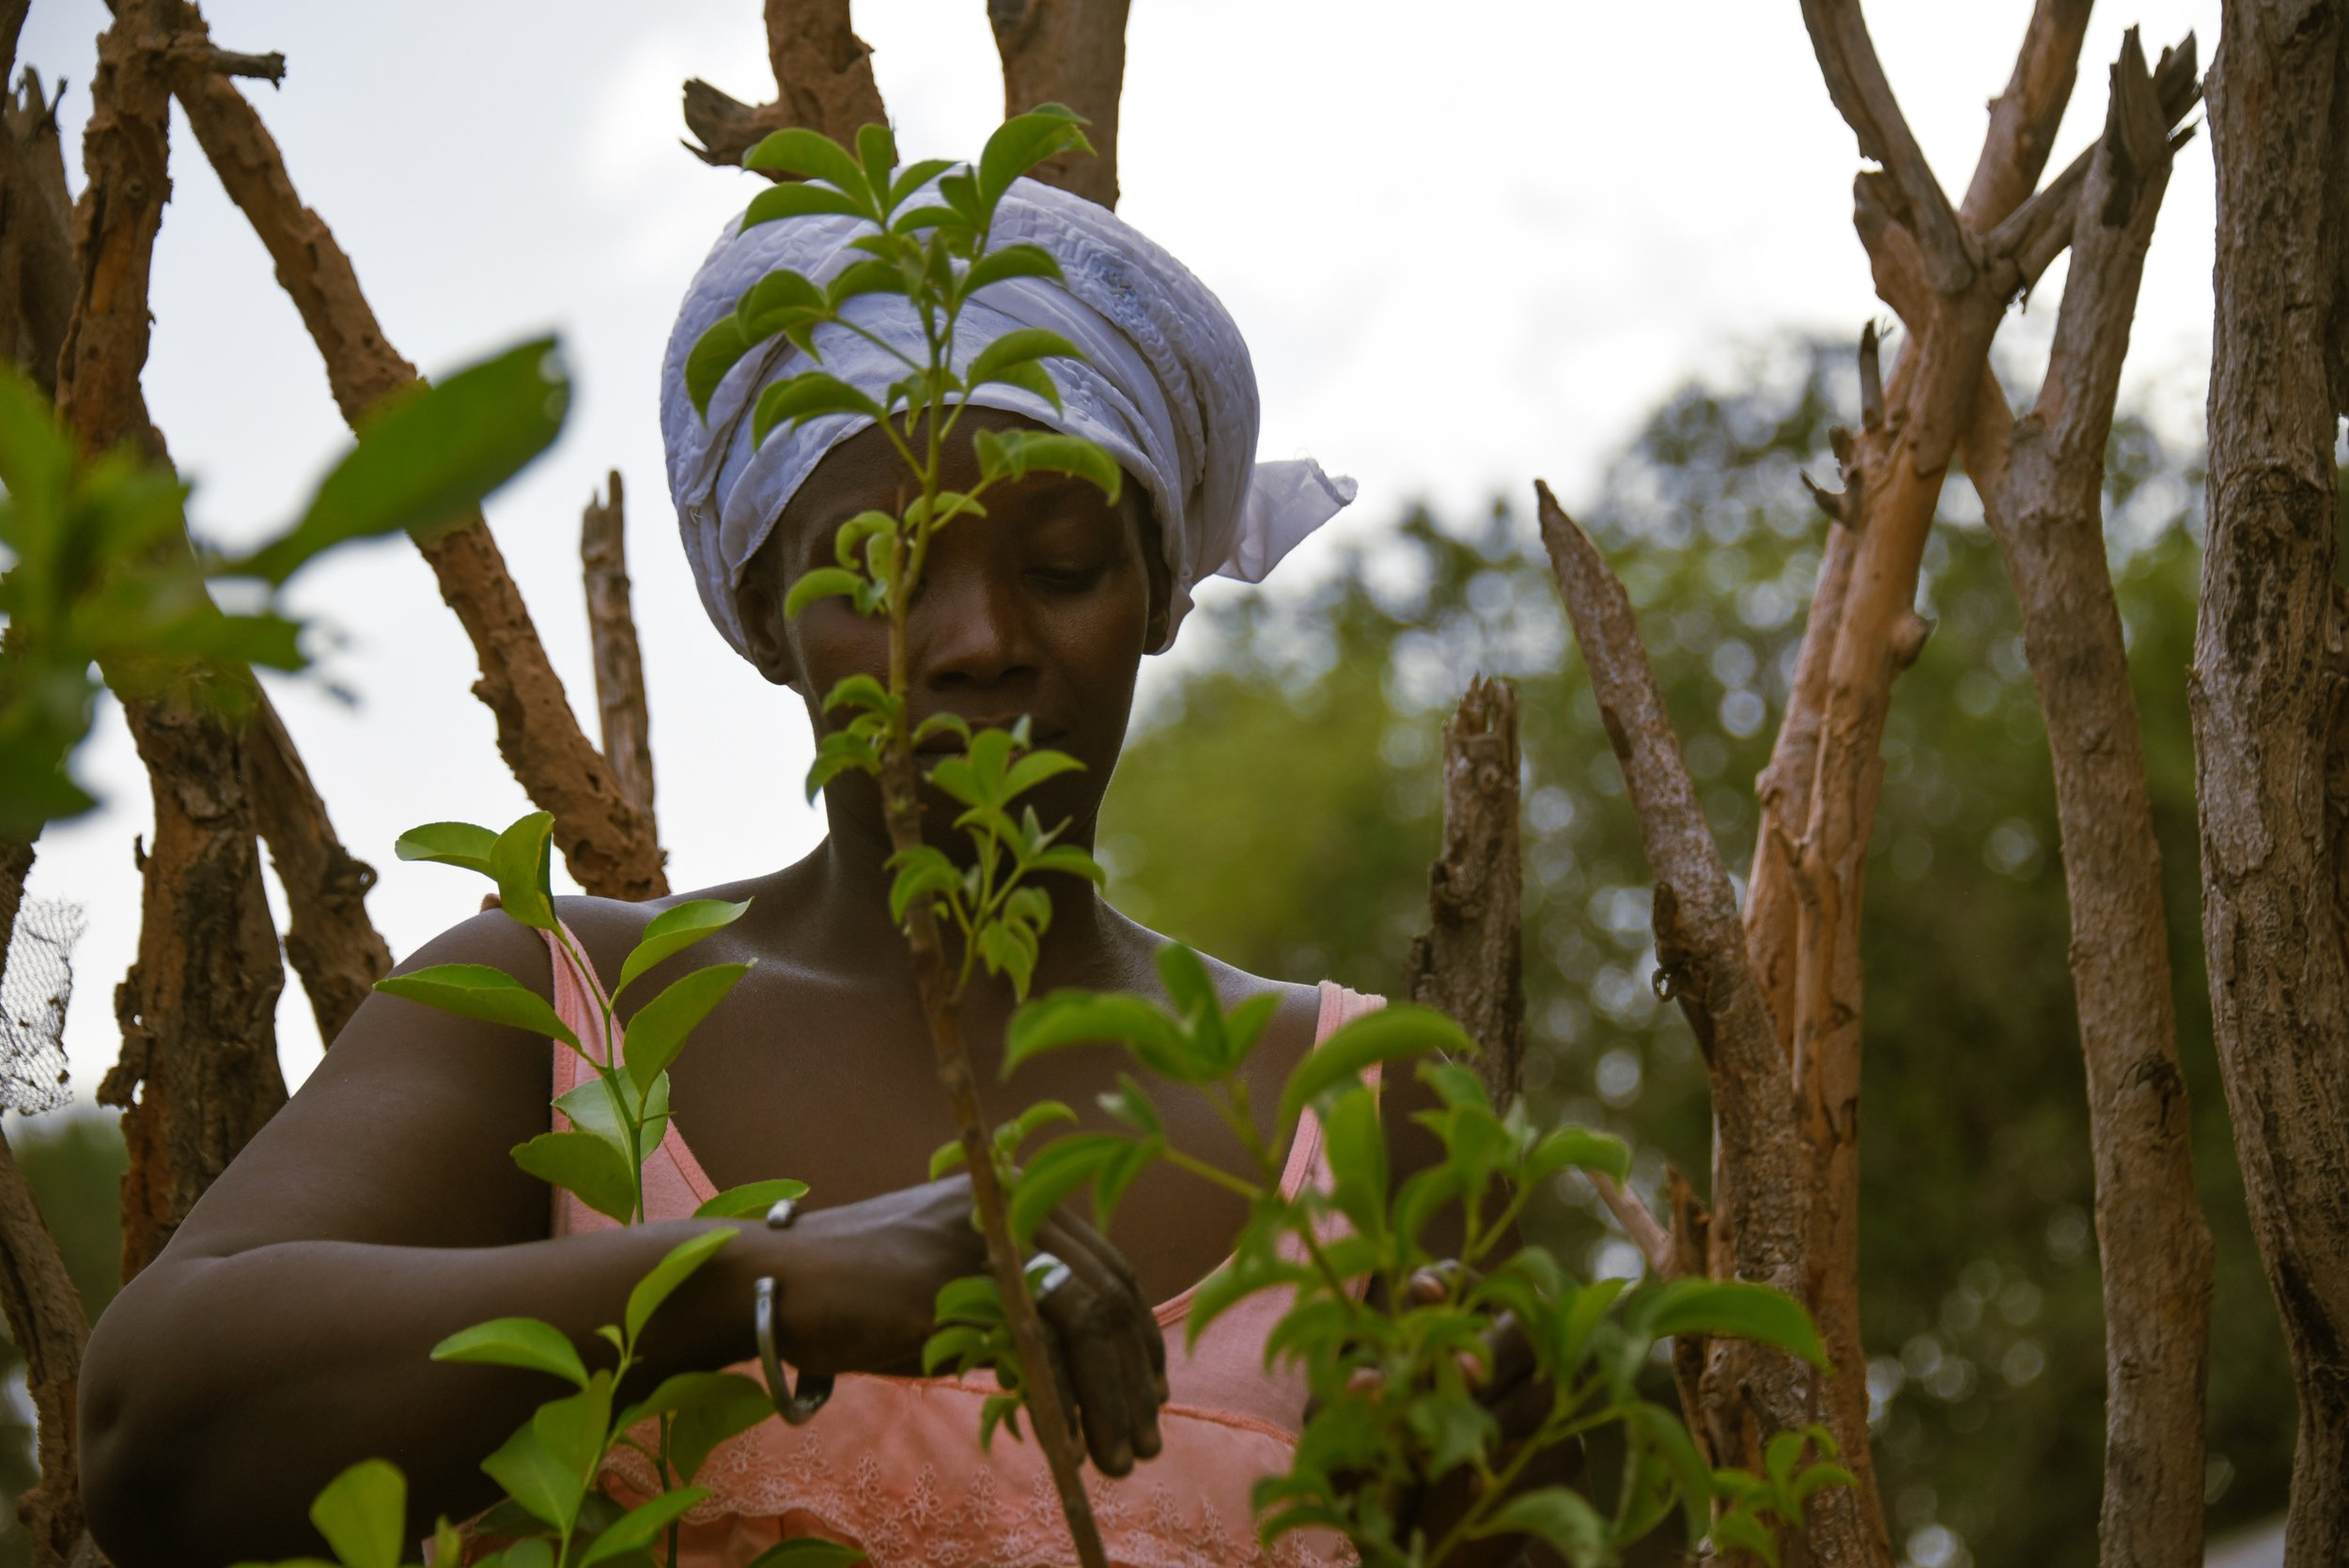 - Ndella Badiane works in the community garden set up by the village association in Ouniock, Casamance. Credit: Traidcraft Exchange\Kate Dixon